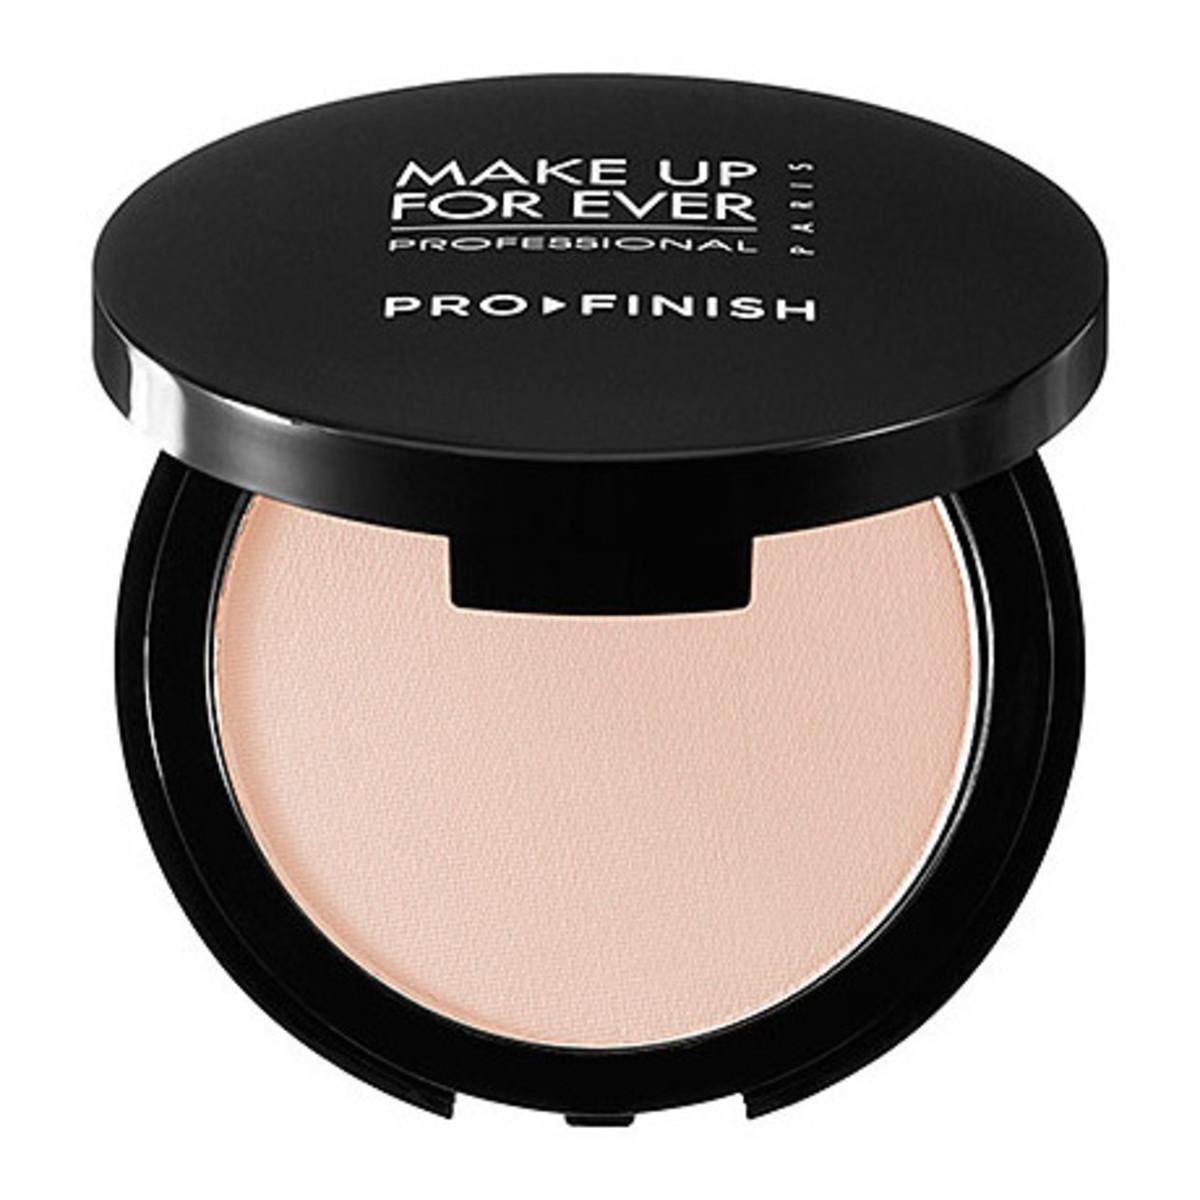 Make Up For Ever Pro Finish Multi-Use Powder Foundation